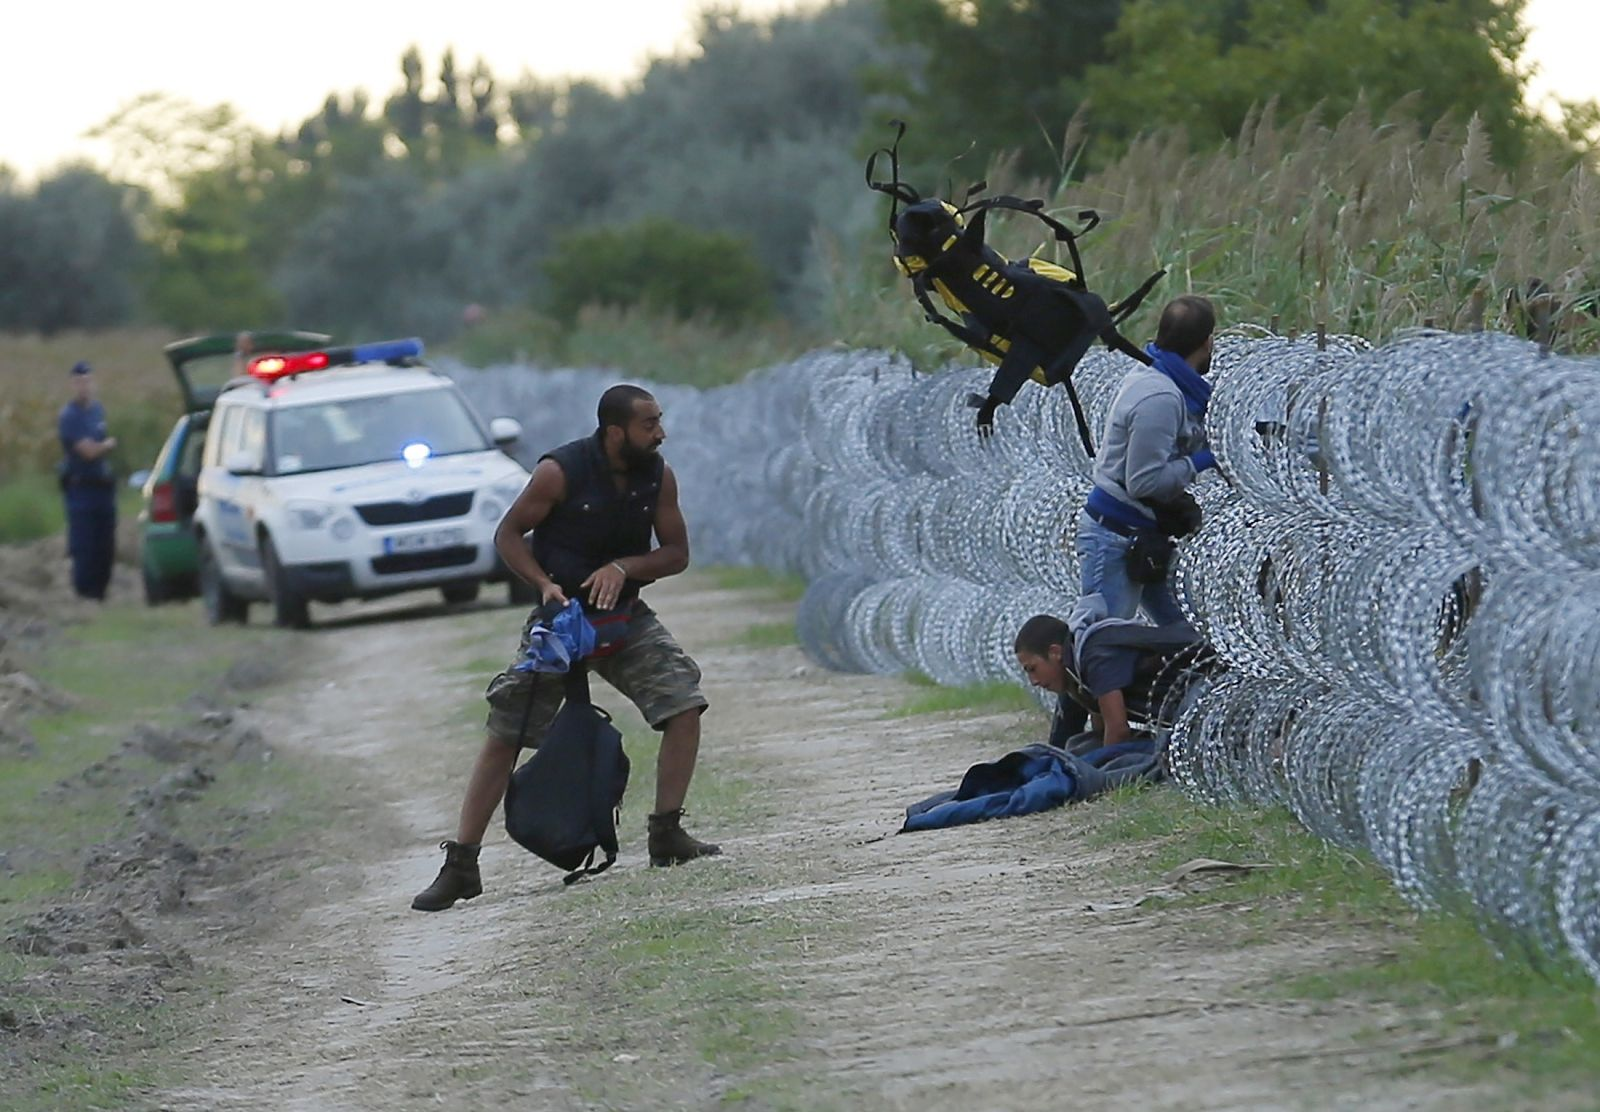 Hungary migrants cross border